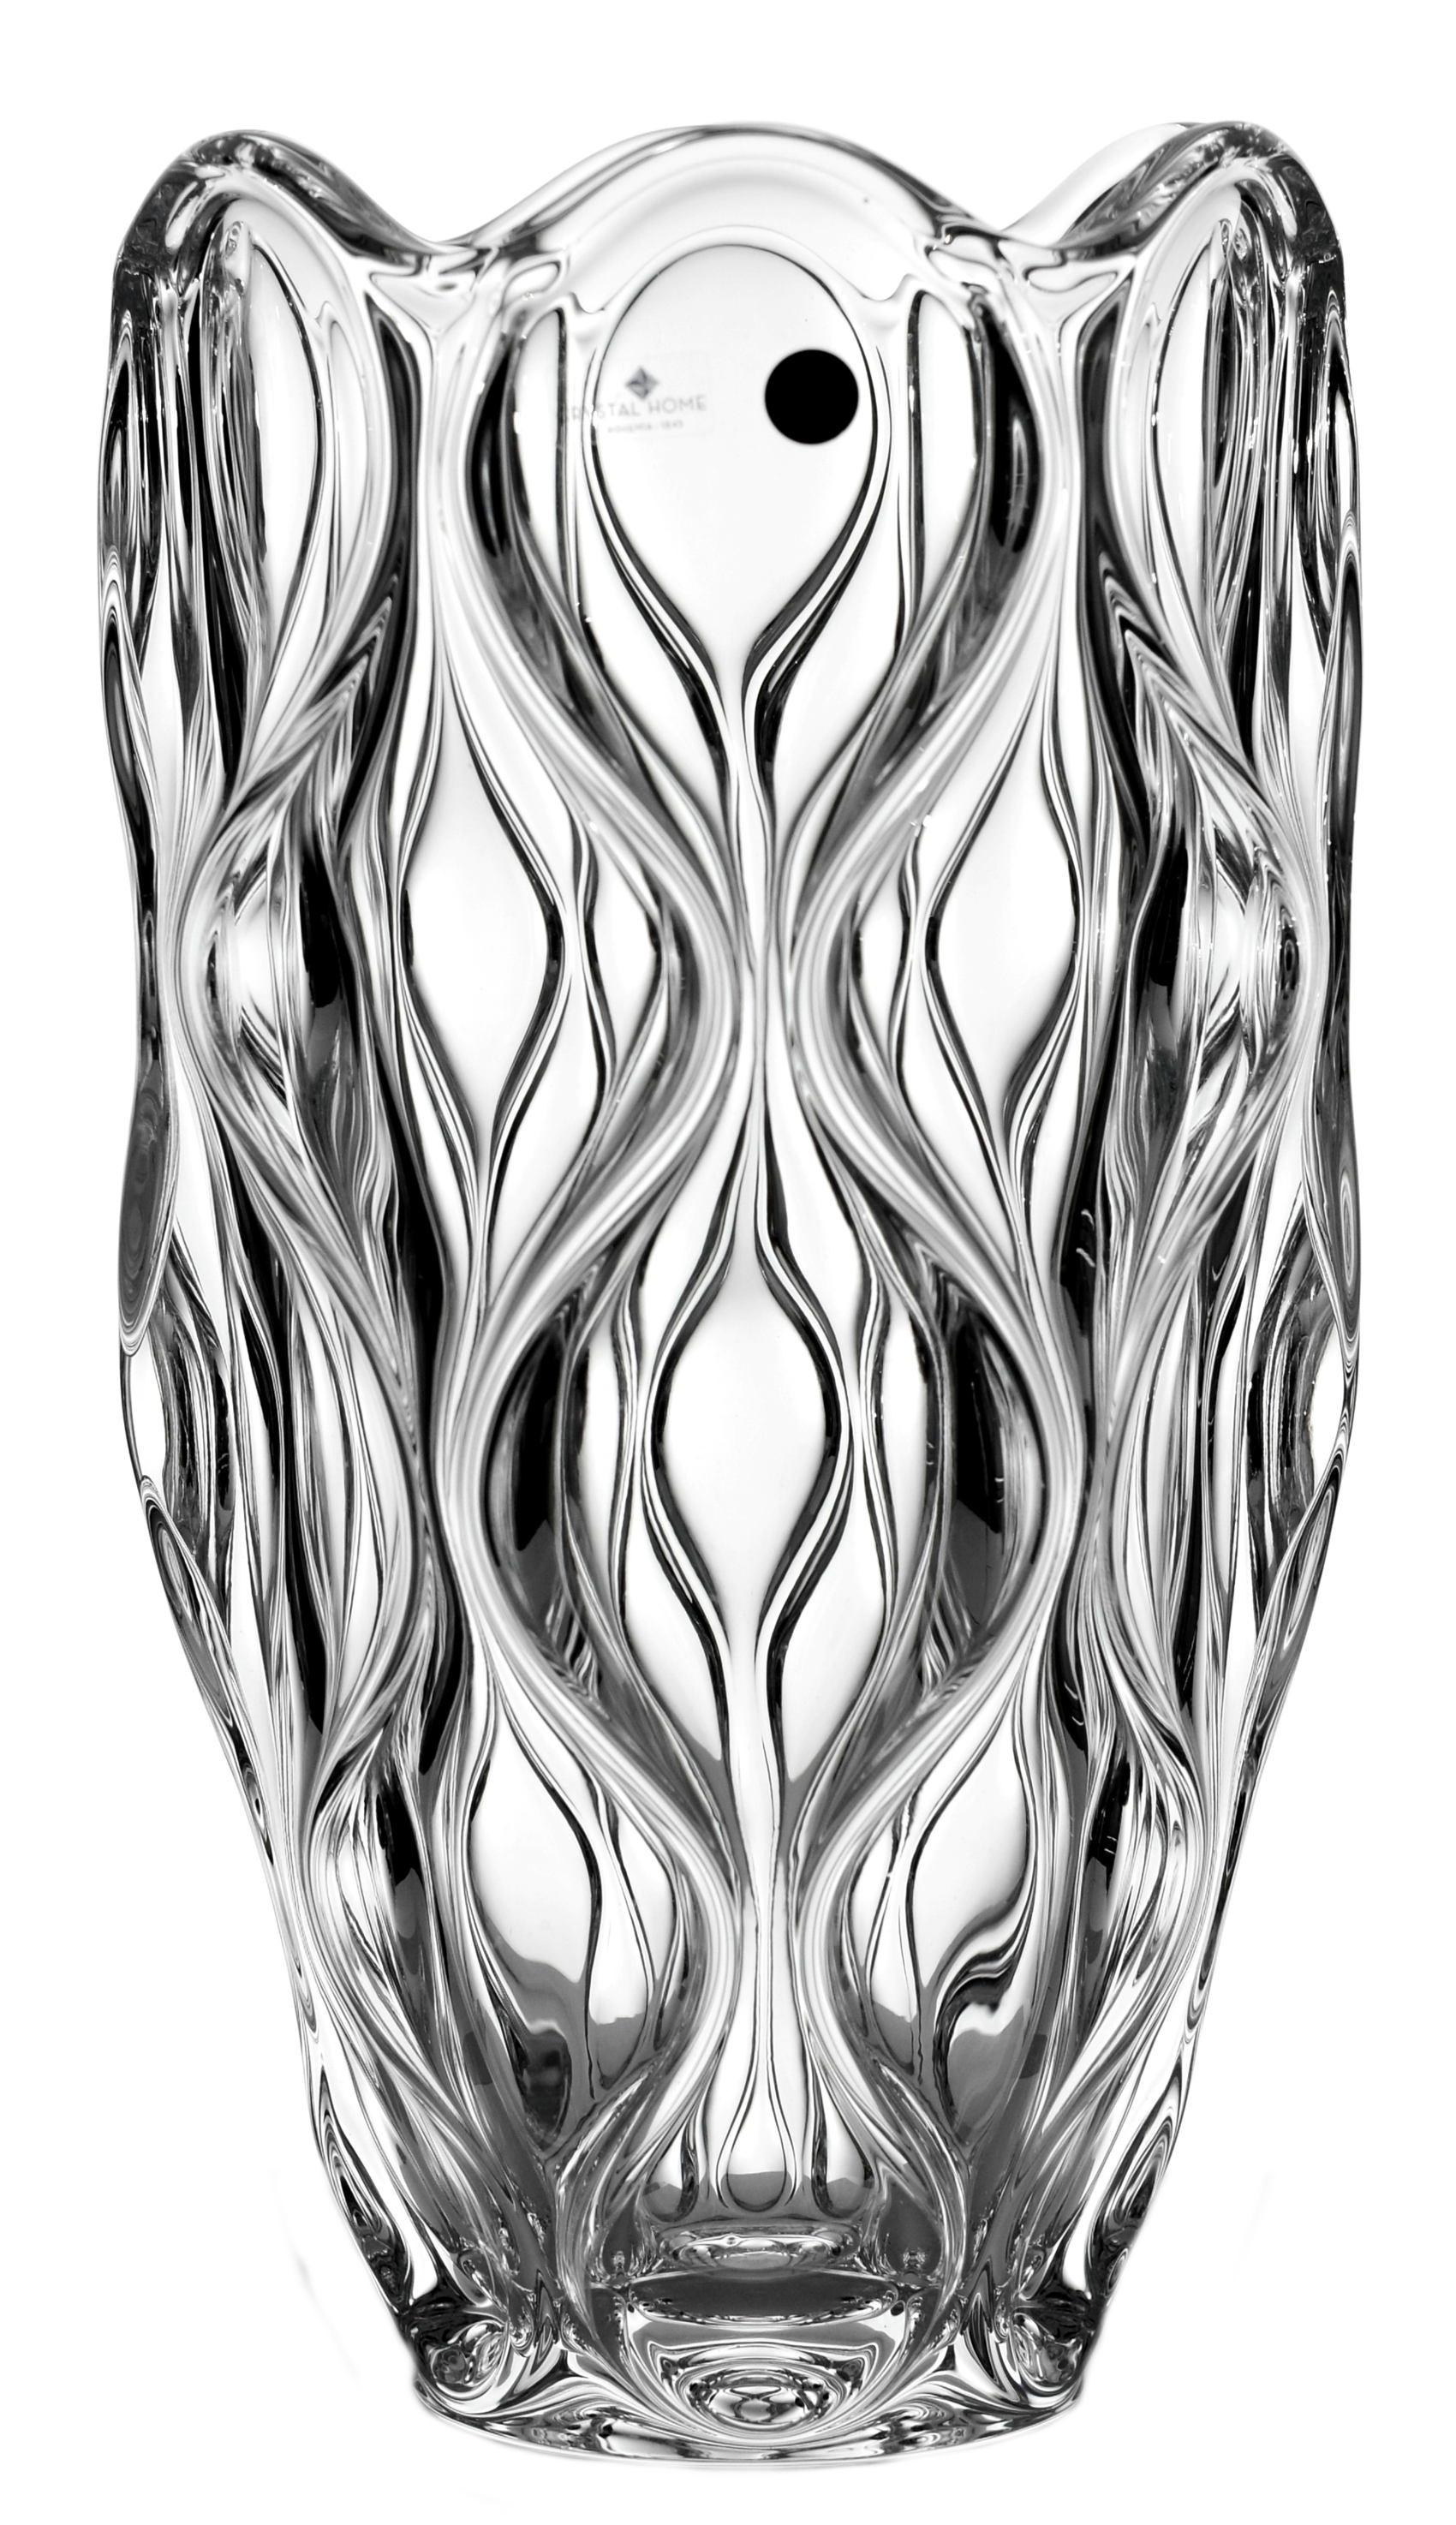 nachtmann art deco crystal vase of vaza ocean bezolovnata½ crystalite va½aka 300 mm favi cz in fvmdzeeob4ij6audy1ygwyustr3s9ar6wm6e11fr